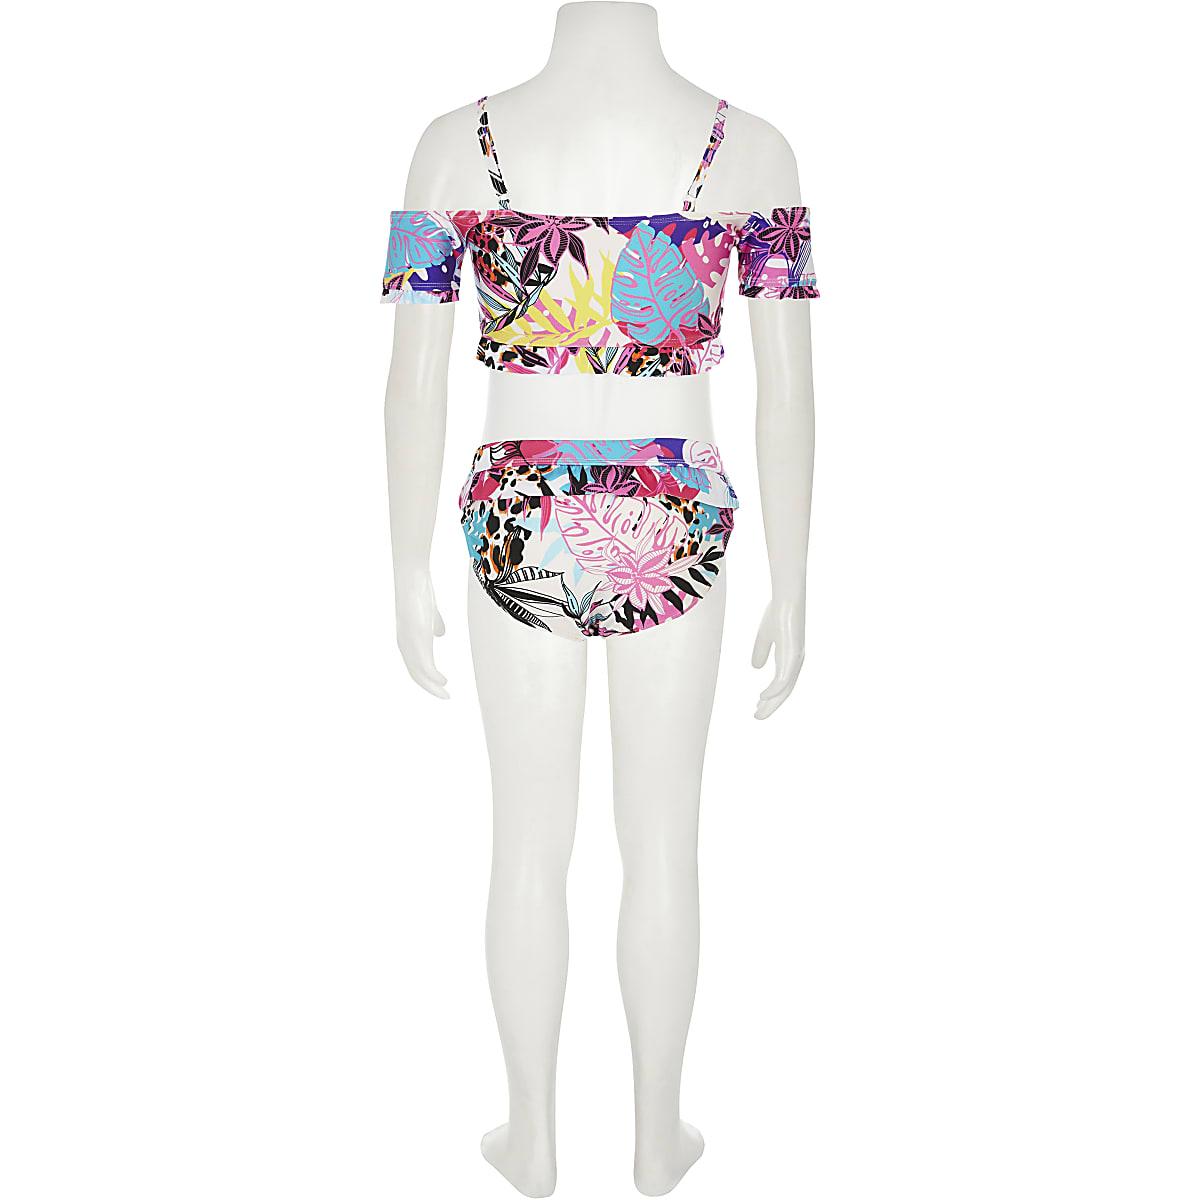 c58eca7f7 Girls white tropical print bardot bikini top - Bikinis - Swimwear ...